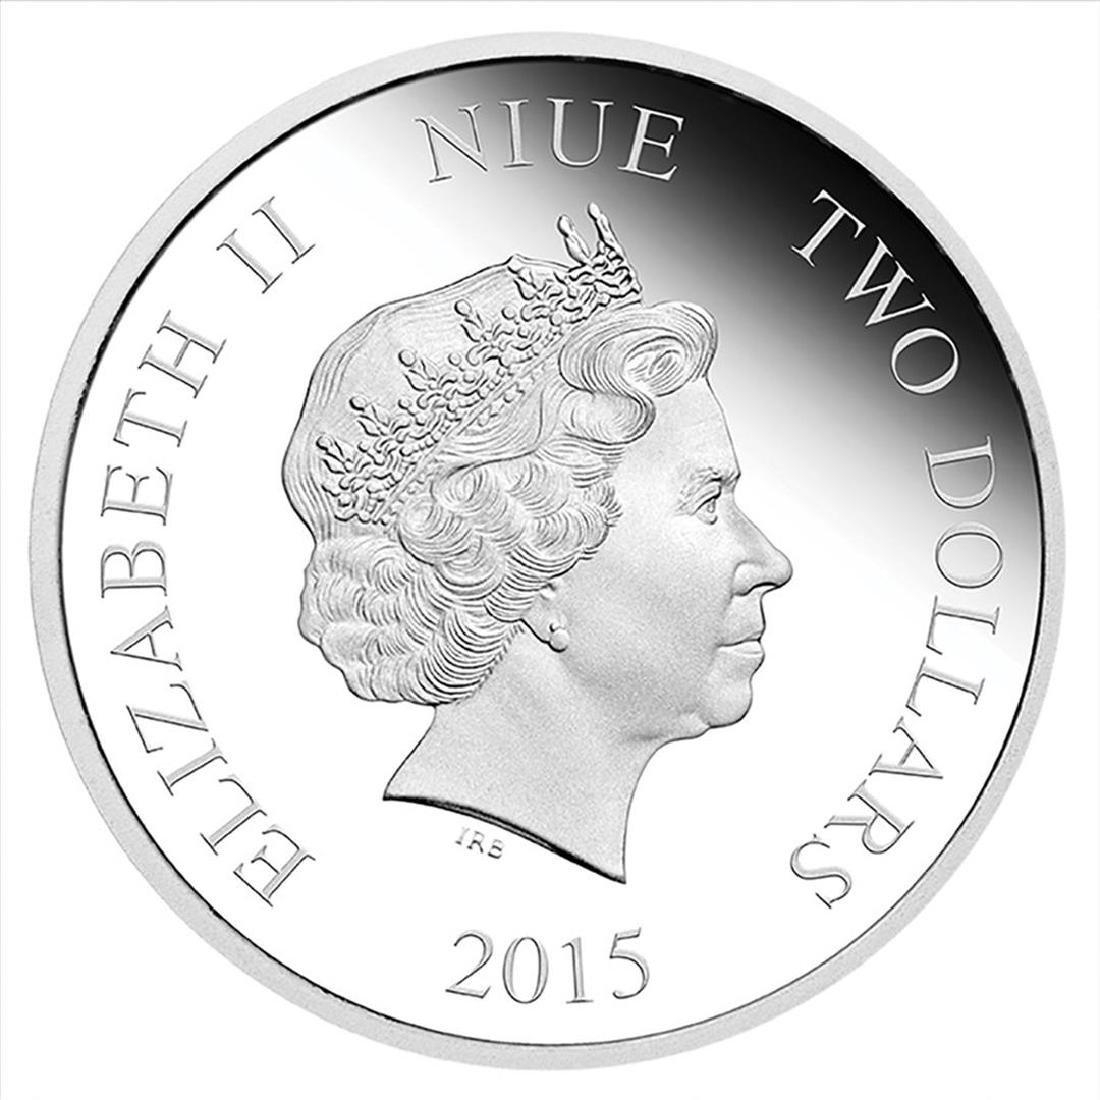 2015 $2 Disney Daisy Duck .999 Fine Silver Proof Coin - 2